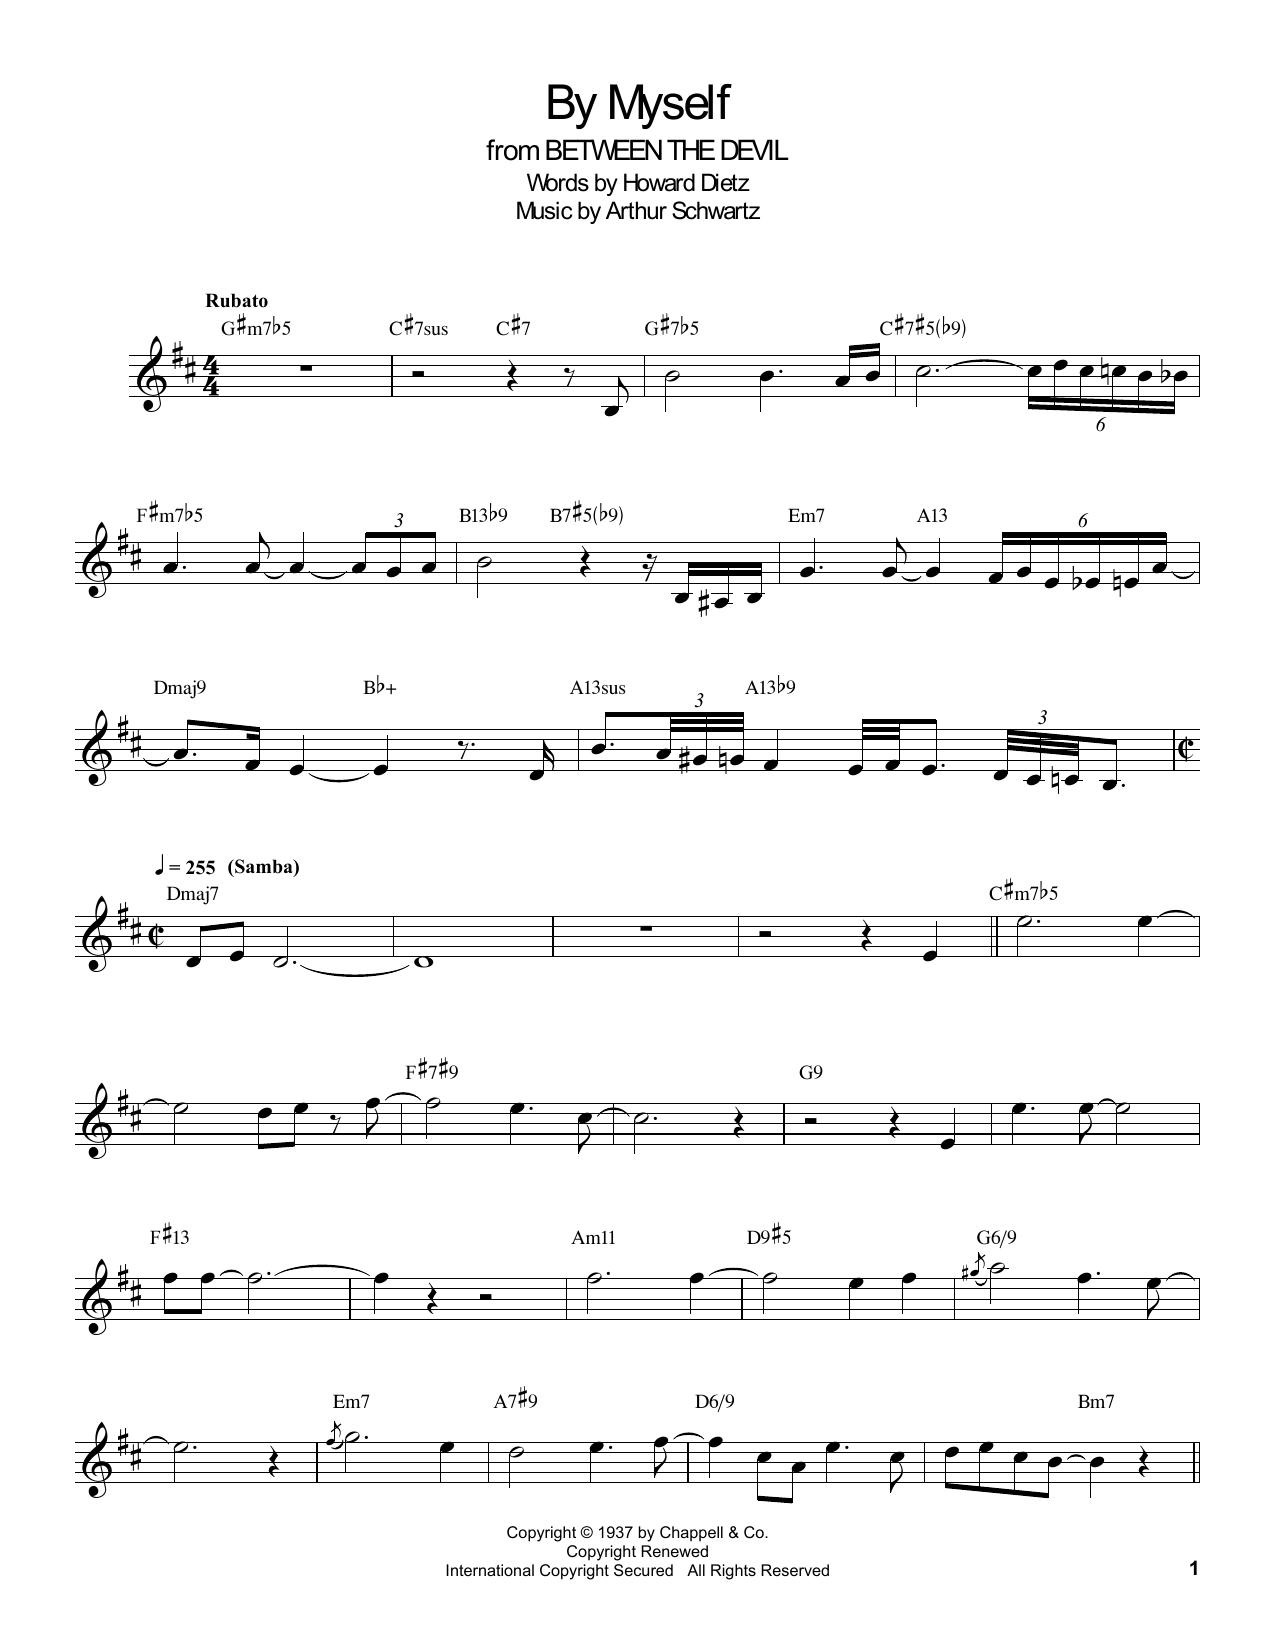 By Myself Sheet Music